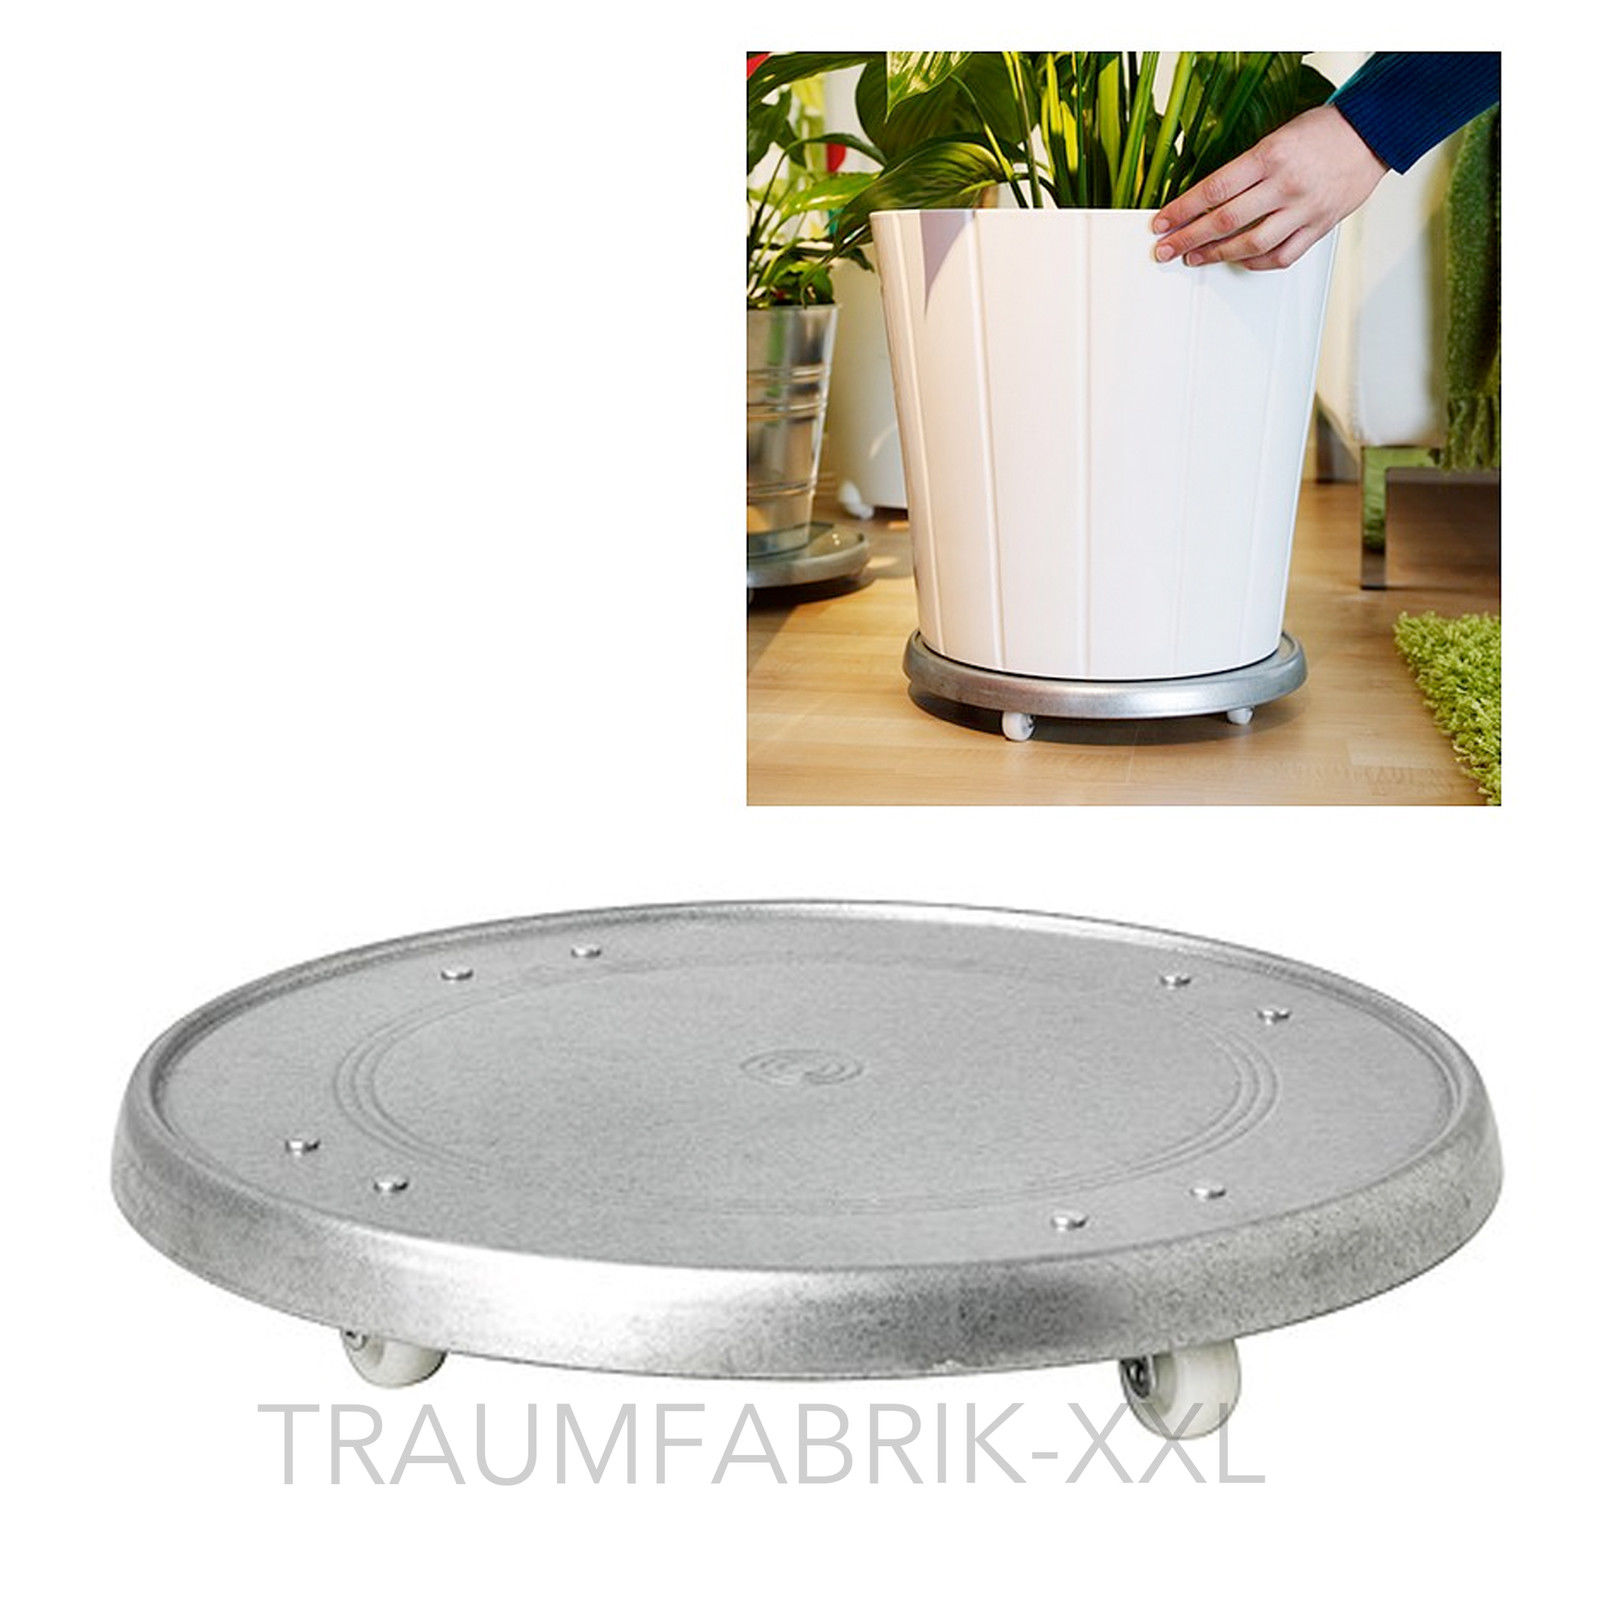 Gartenmöbel | Produktkategorien | Traumfabrik XXL